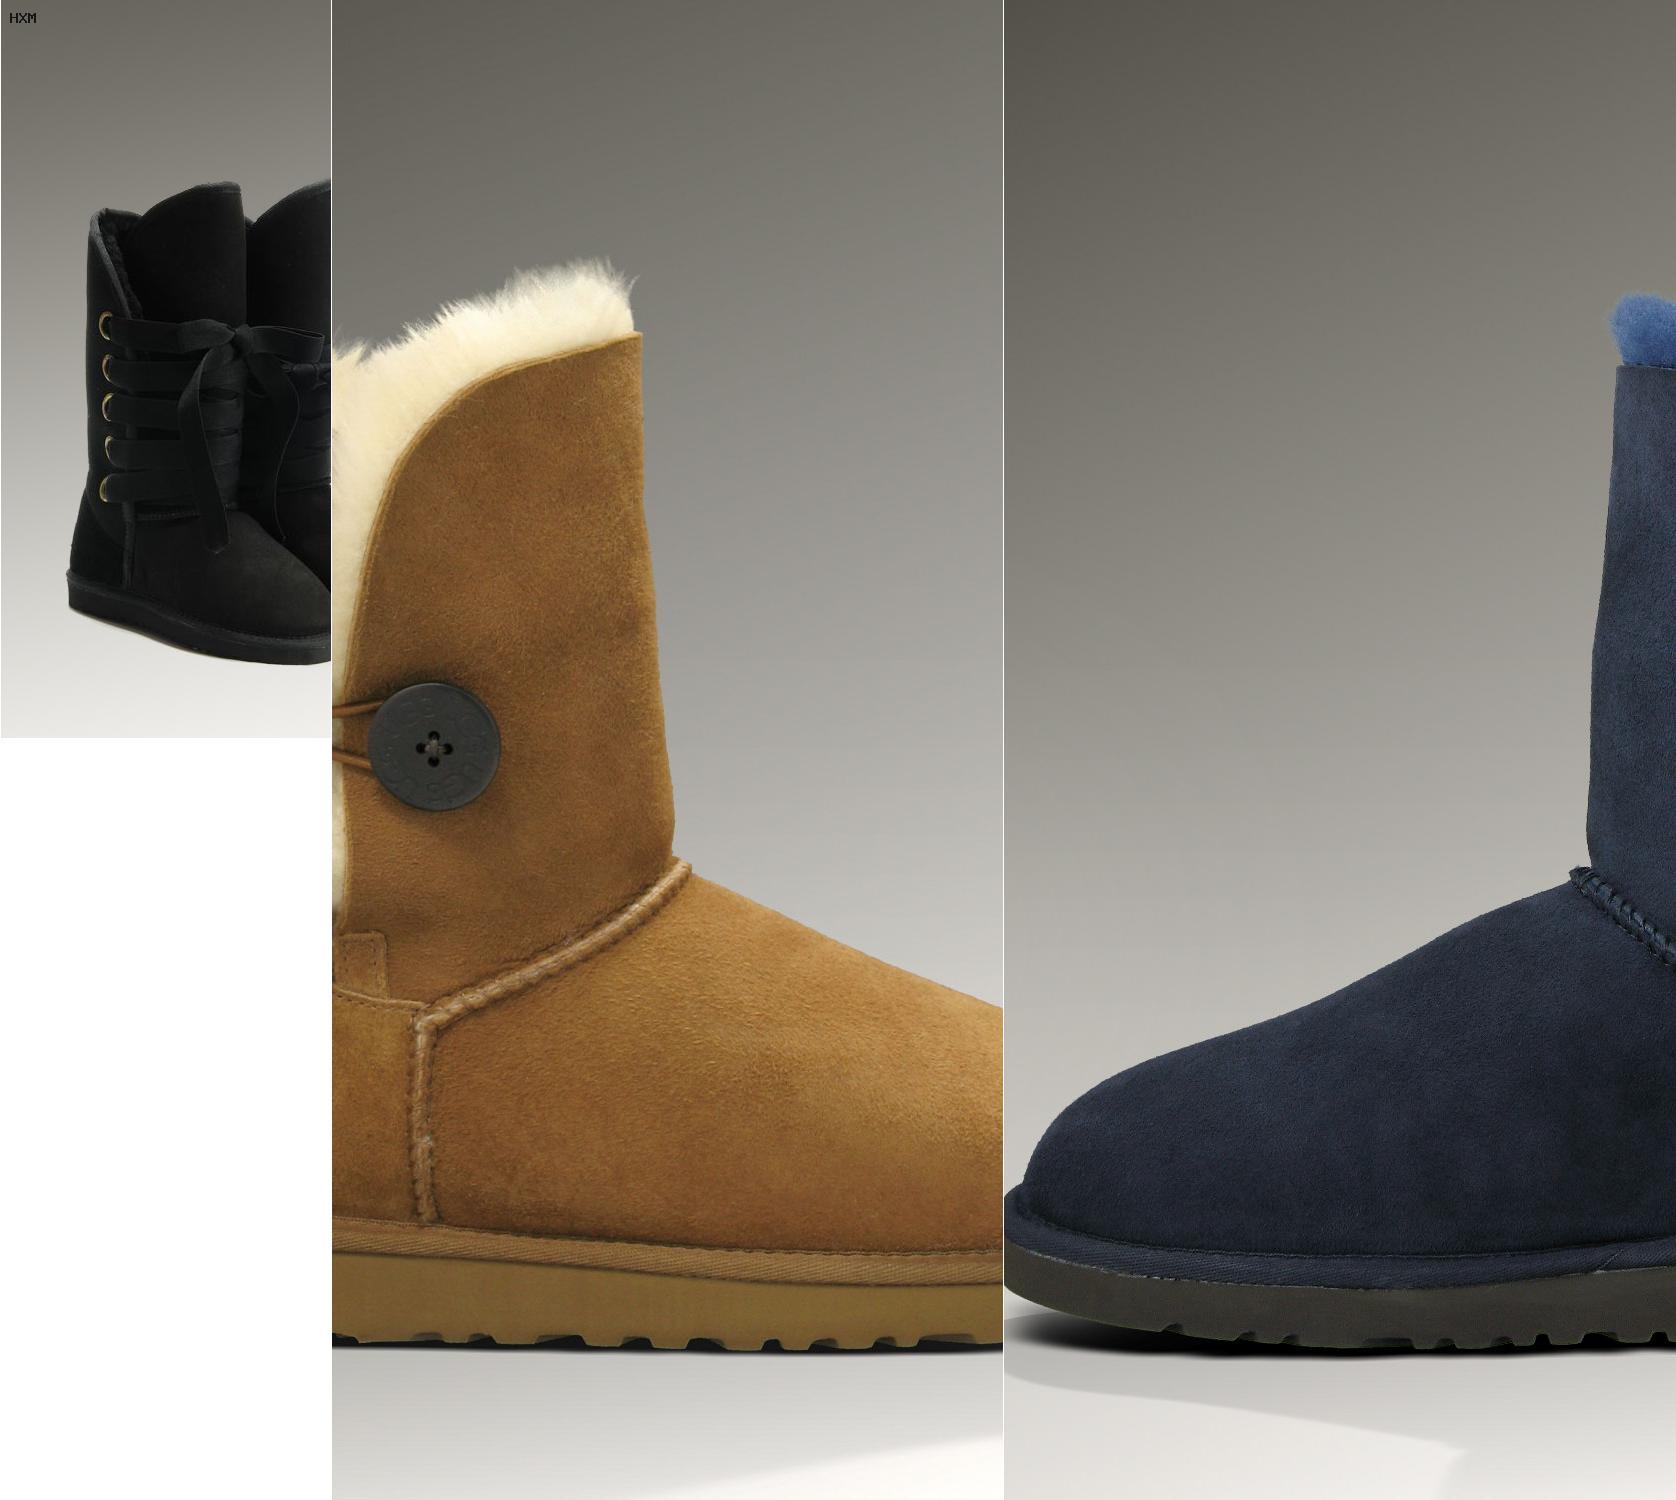 prezzo scarpe ugg